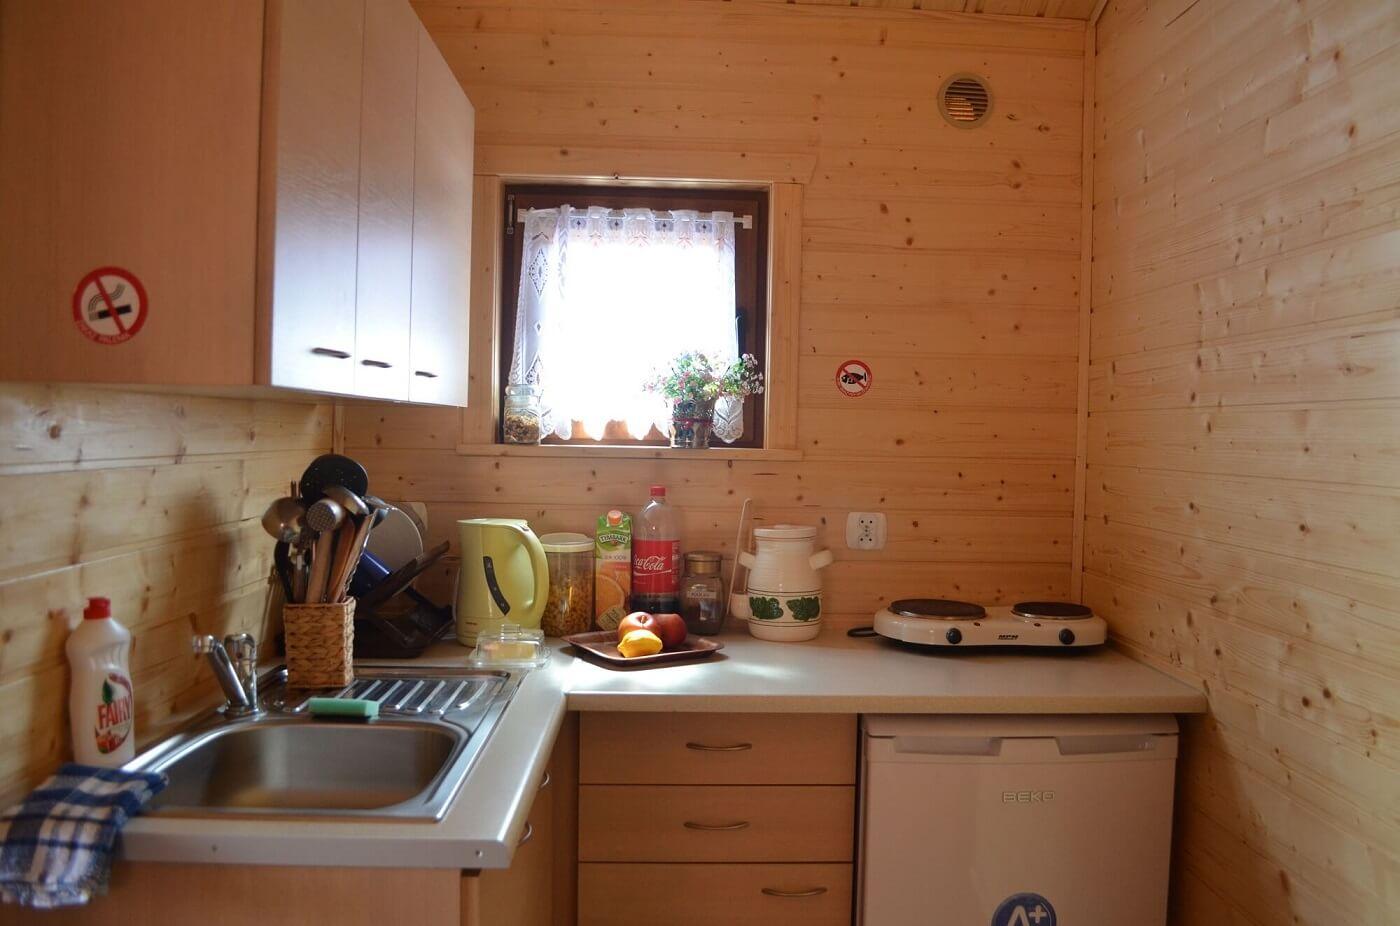 Kuchnia w domku nad morzem